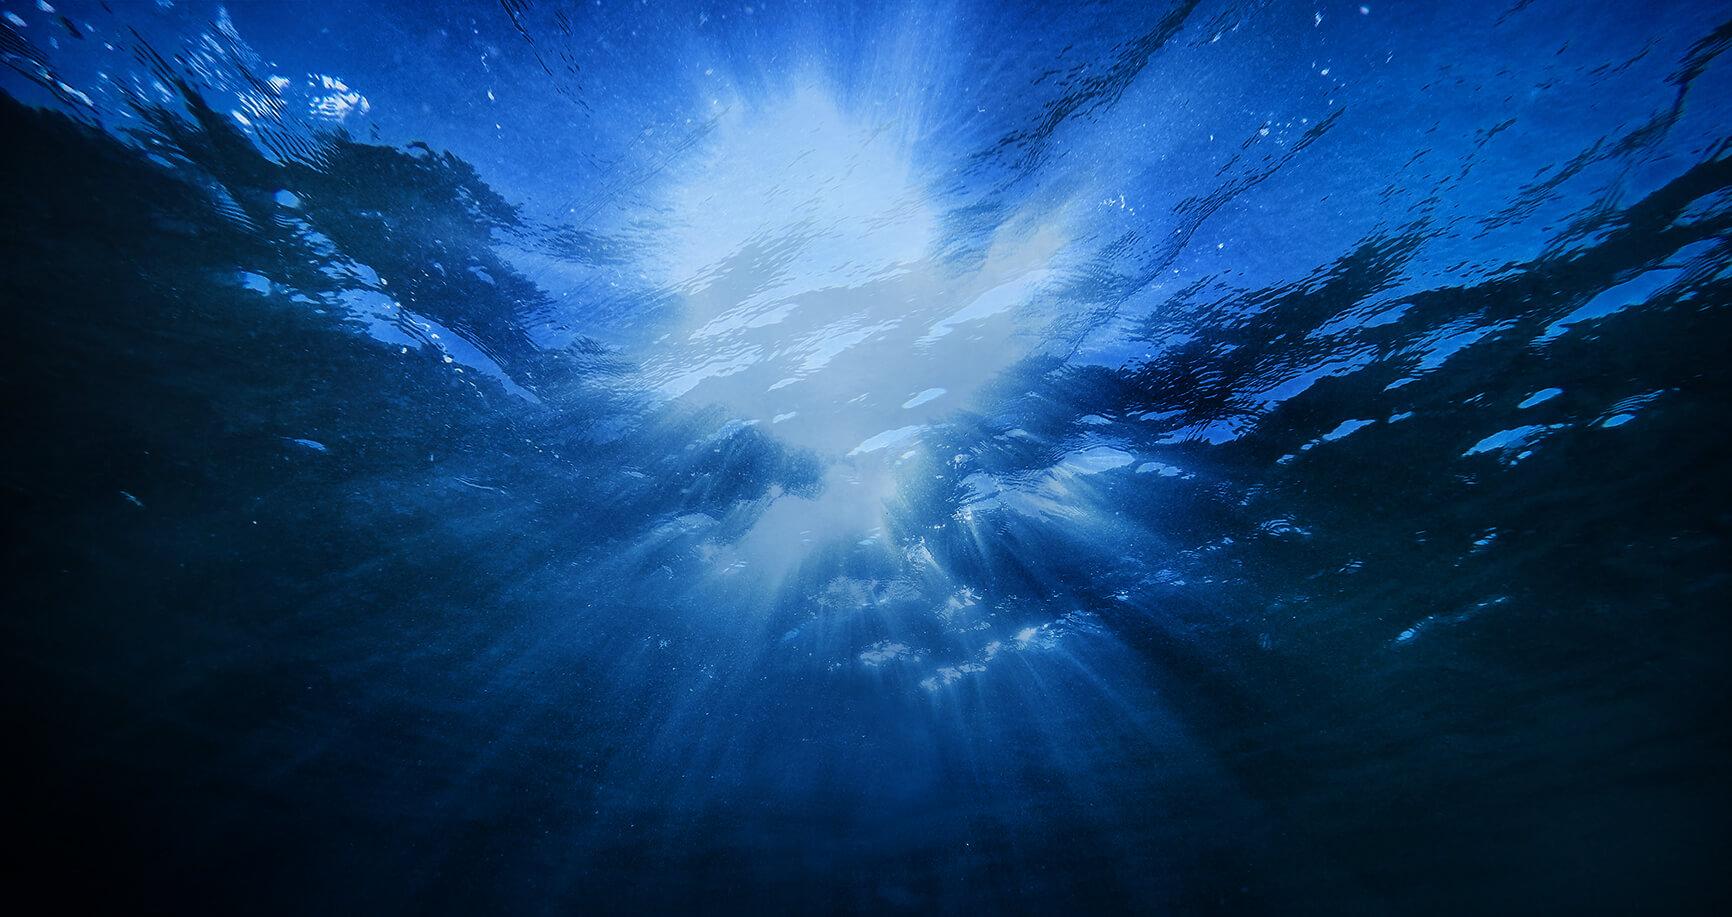 Qrill aqua - Antarctic krill in feed